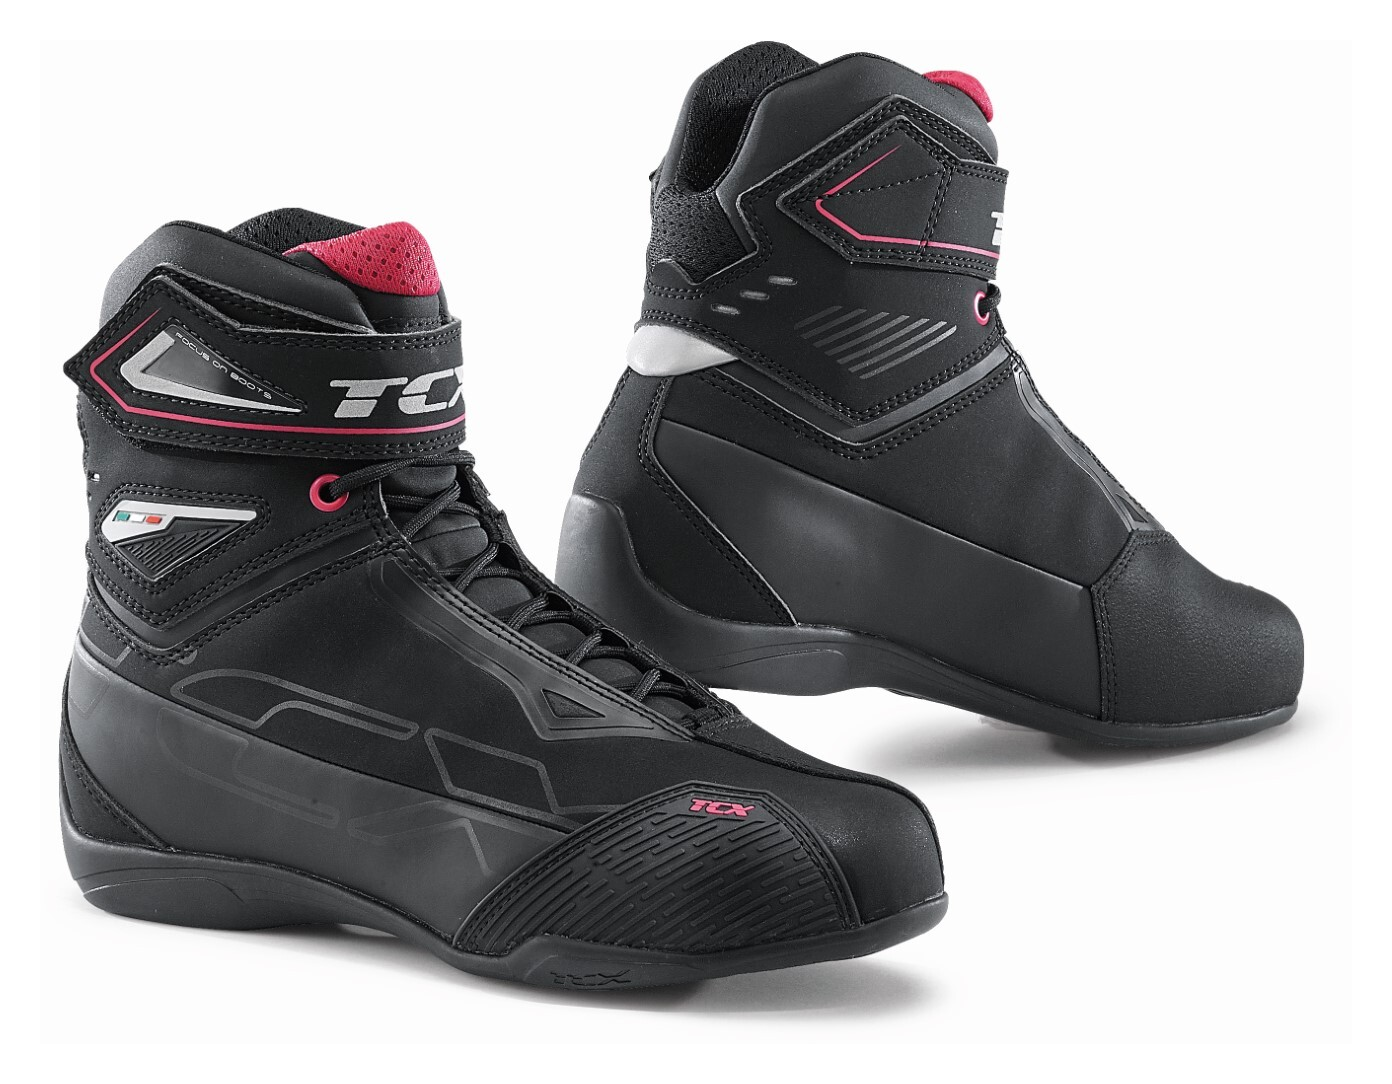 TCX Rush 2 Waterproof Urban Motorcycle Boots Black 43